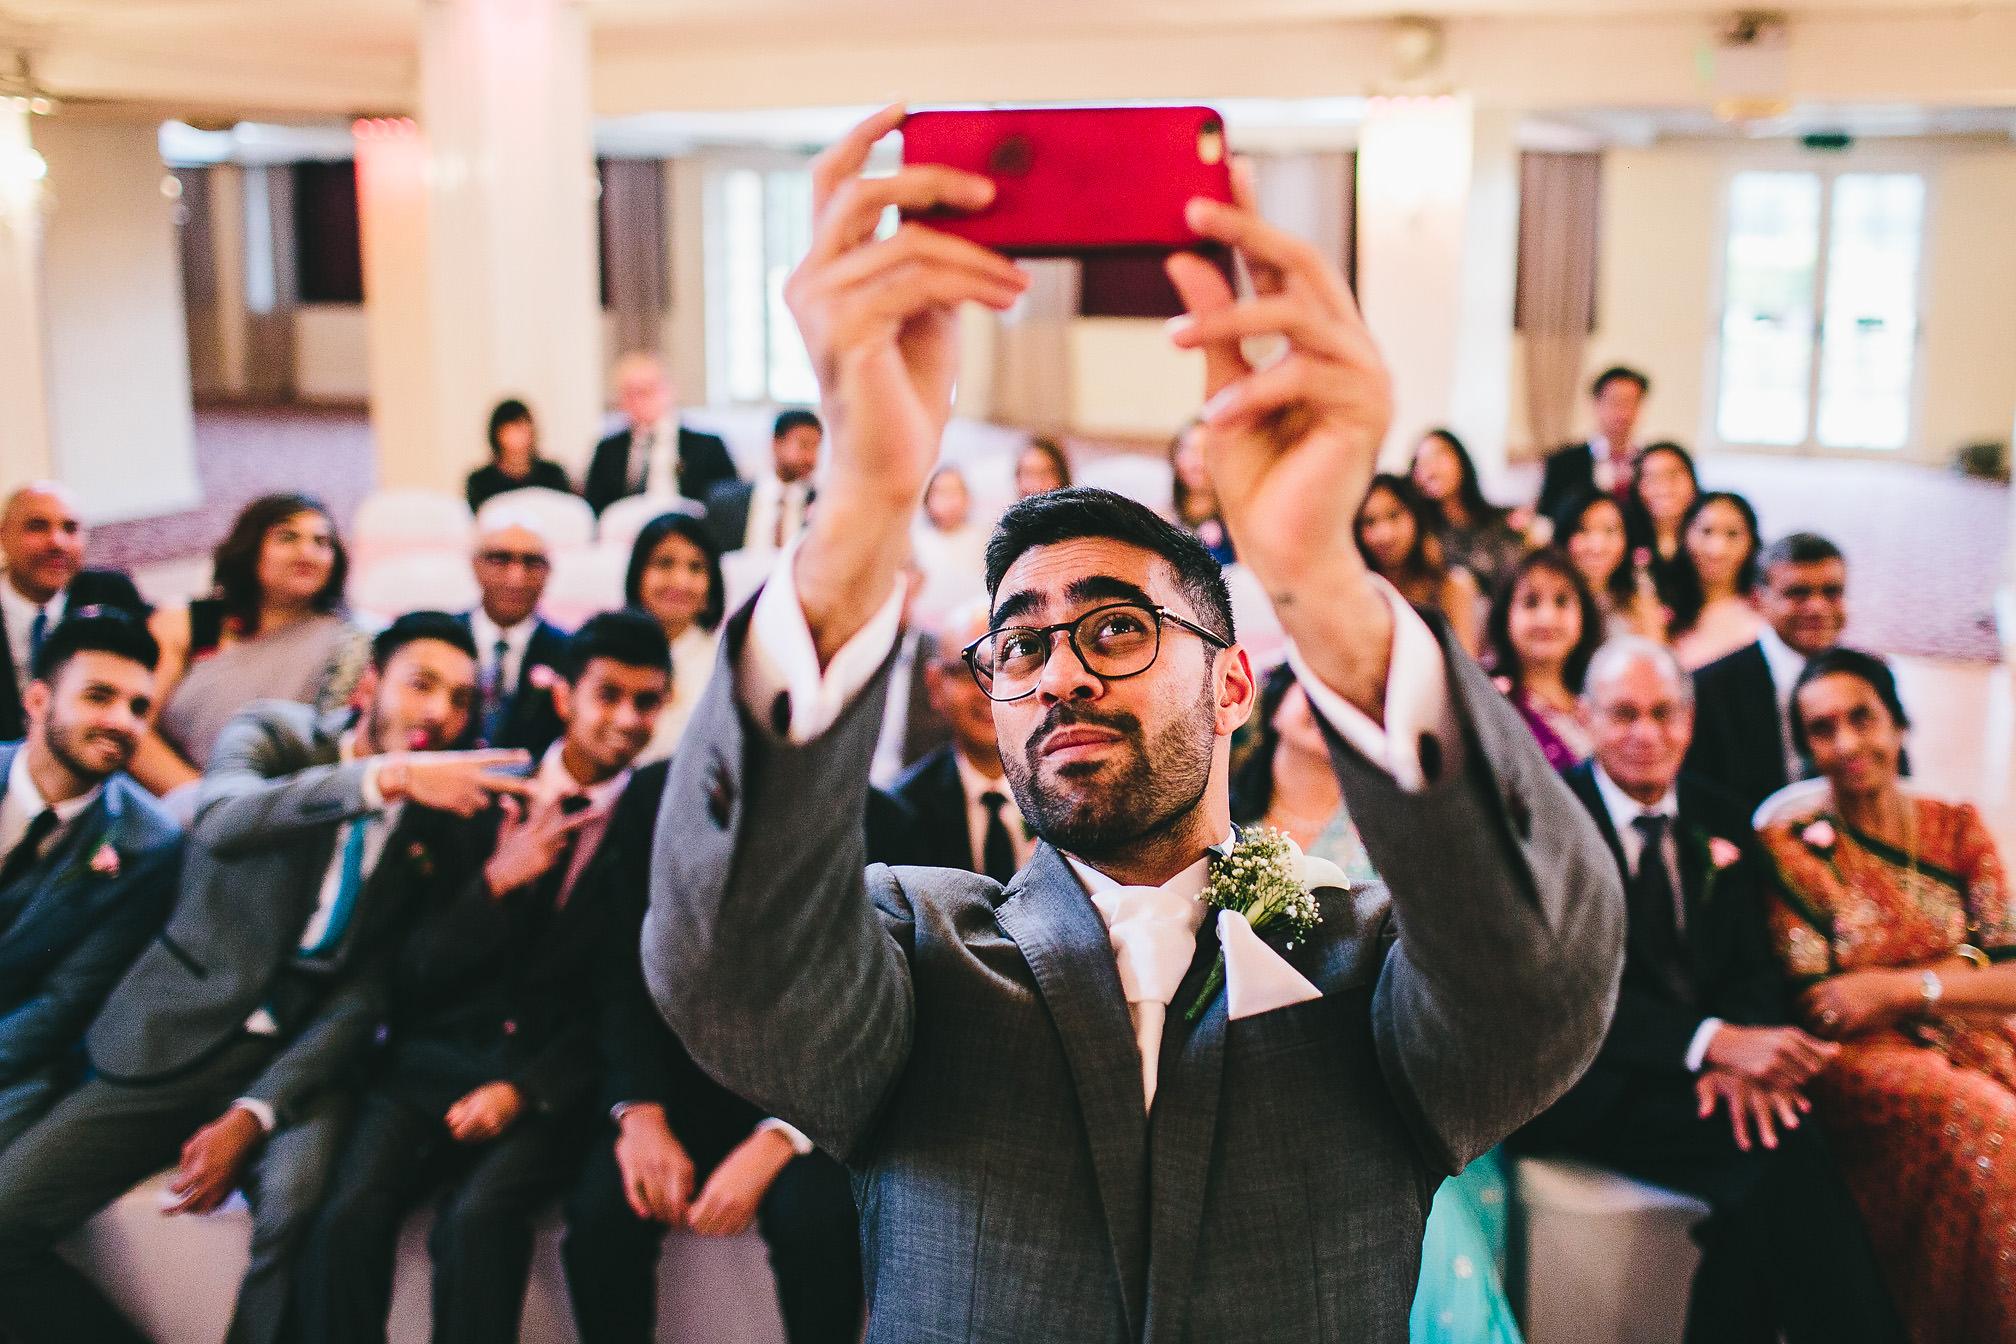 Grooms Epic Wedding Selfie